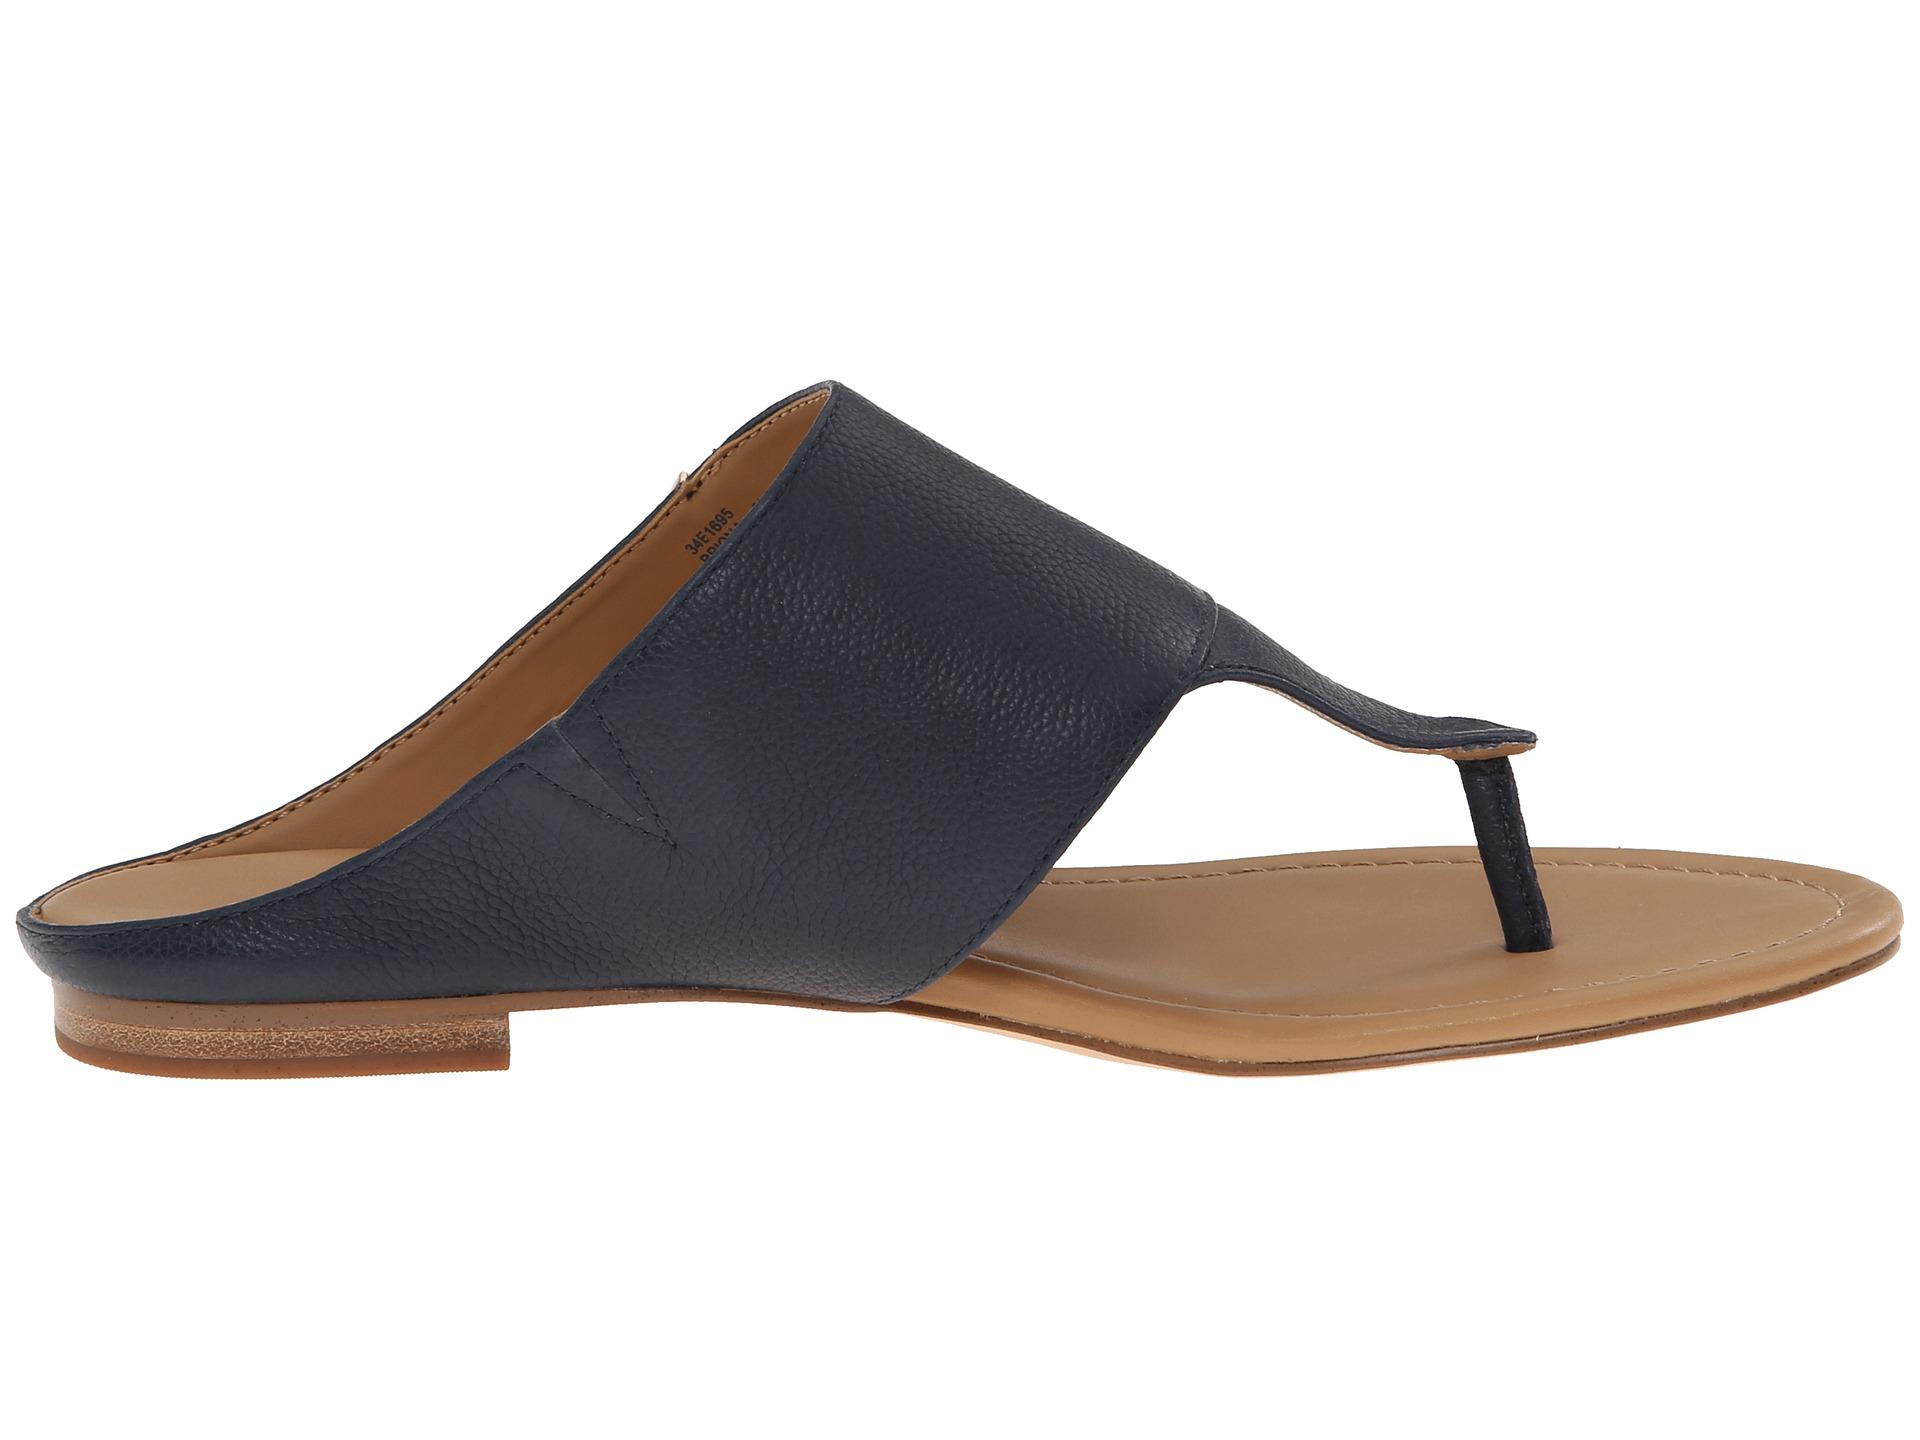 Calvin Klein Womens Briona Black Toscana Leather - Sandals